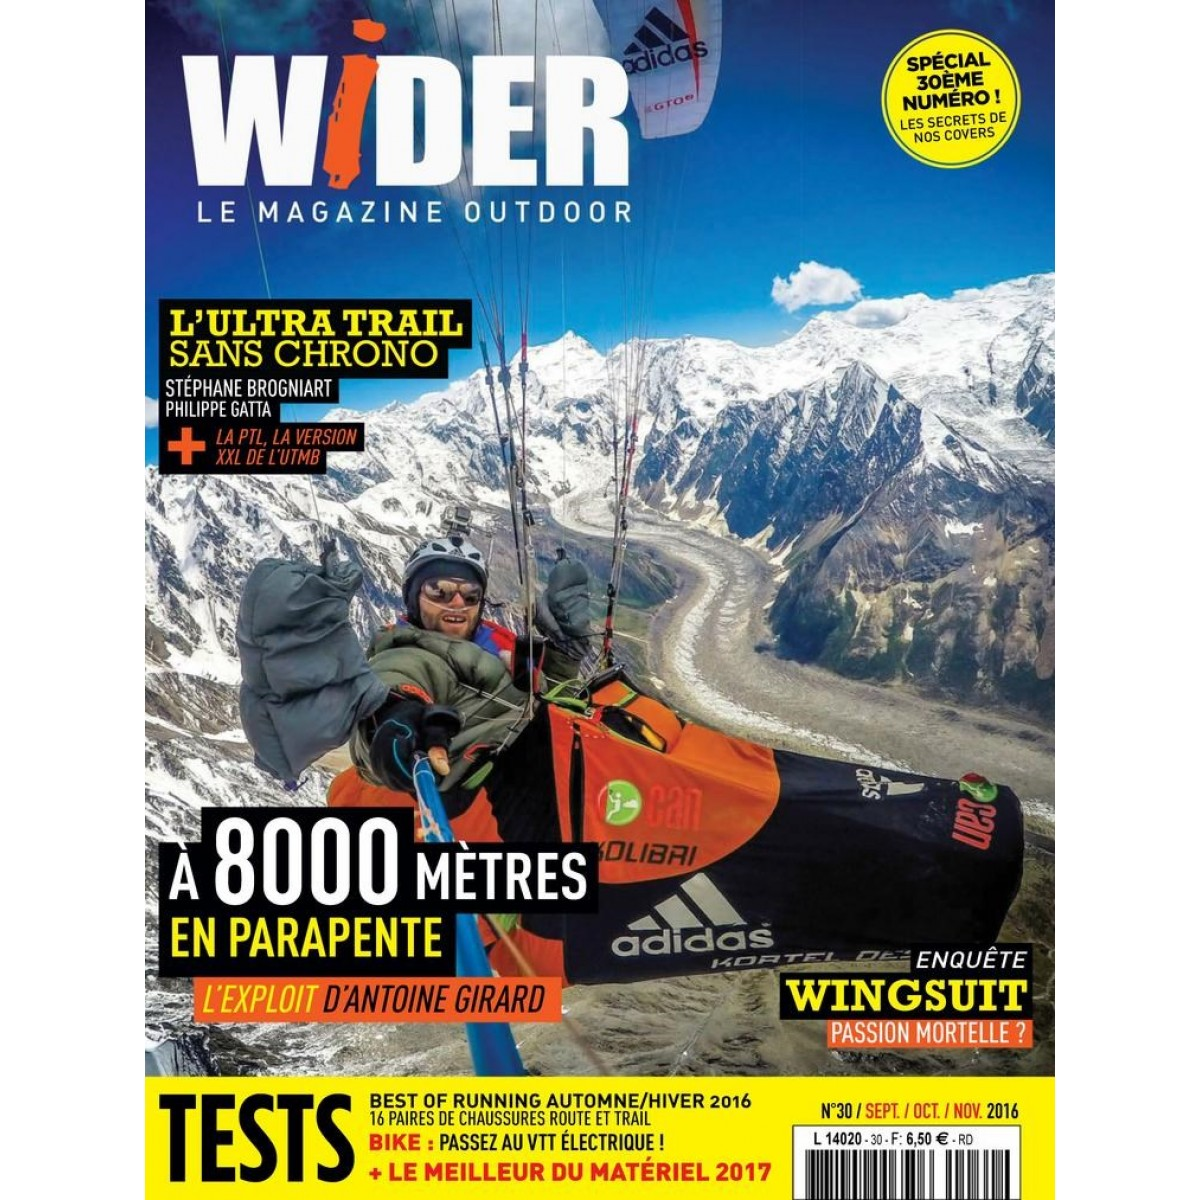 abonnement wider magazine pas cher mag24 discount. Black Bedroom Furniture Sets. Home Design Ideas